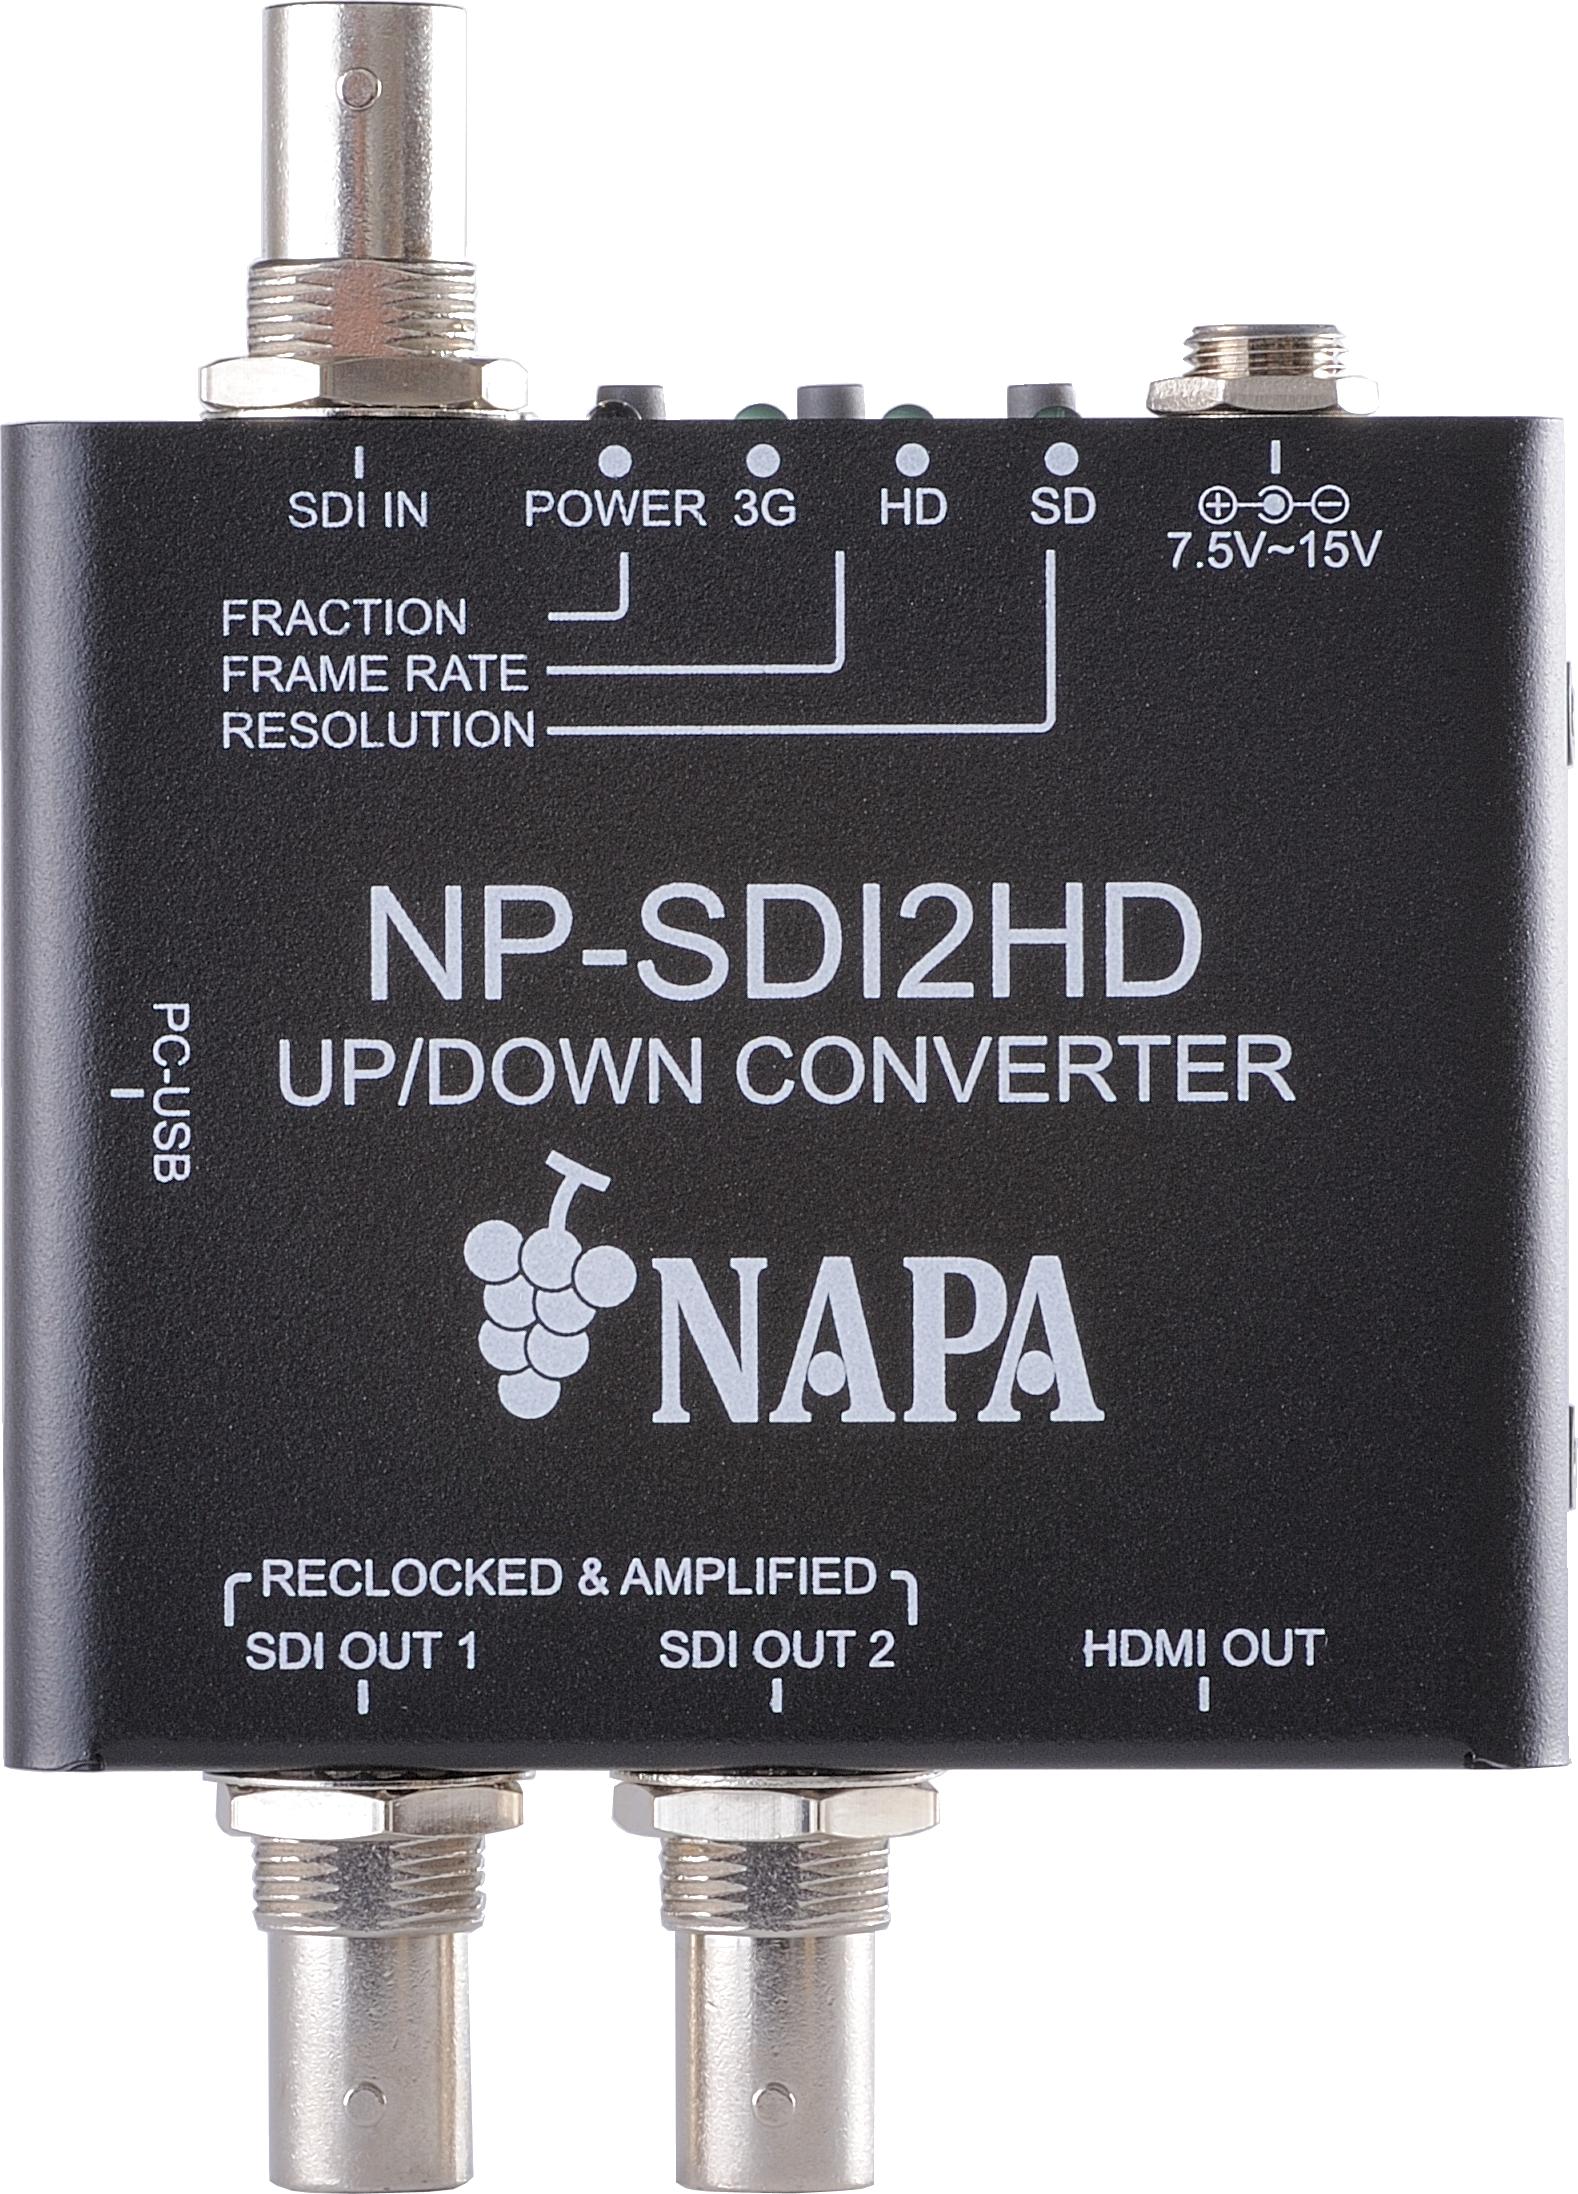 NP-SDI2HD